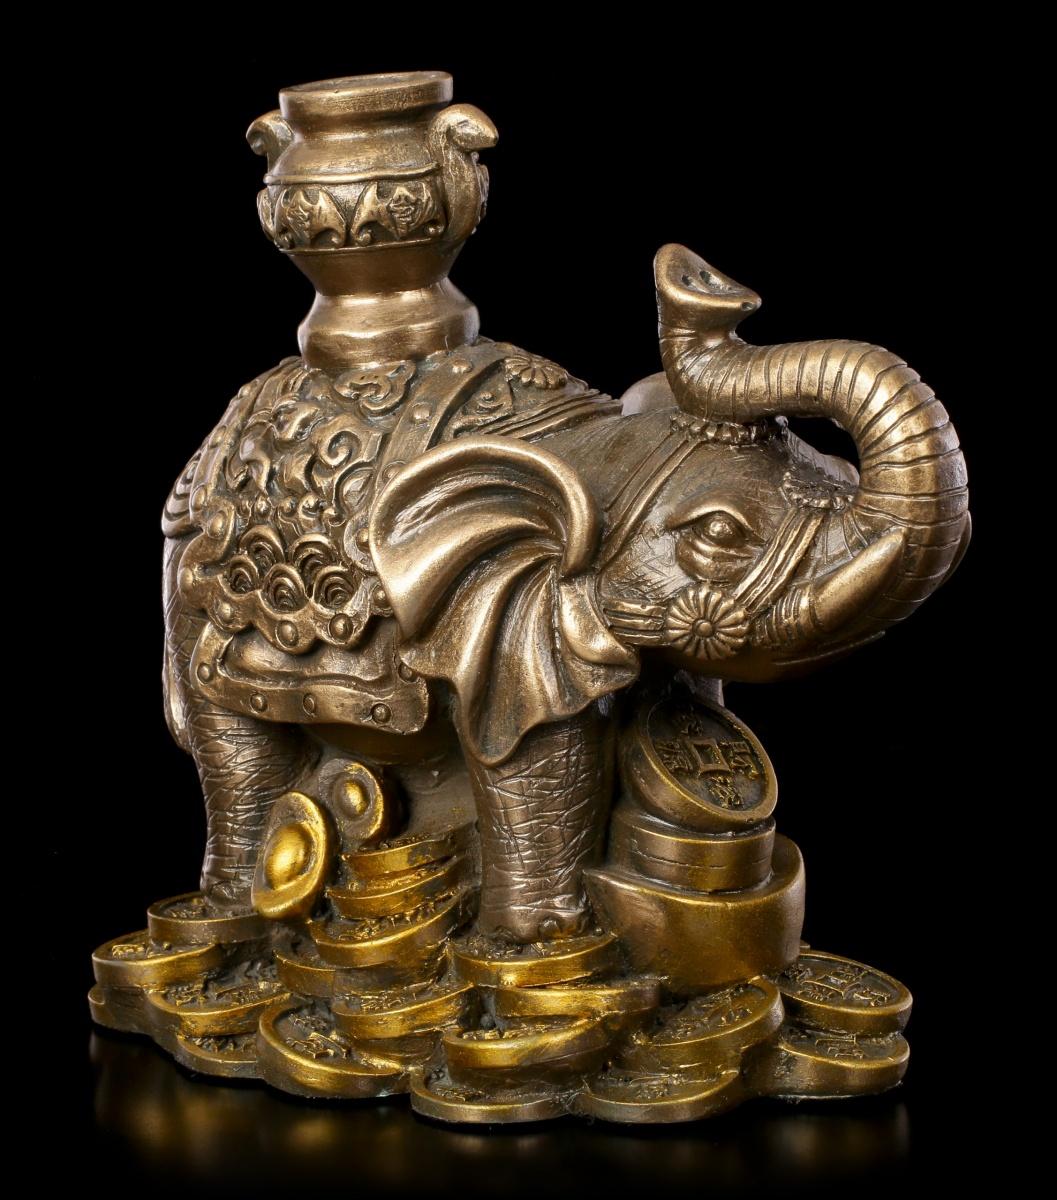 Feng Shui Figuren : feng shui figur elefant mit goldst cken gl ck reichtum statue deko ebay ~ Yuntae.com Dekorationen Ideen